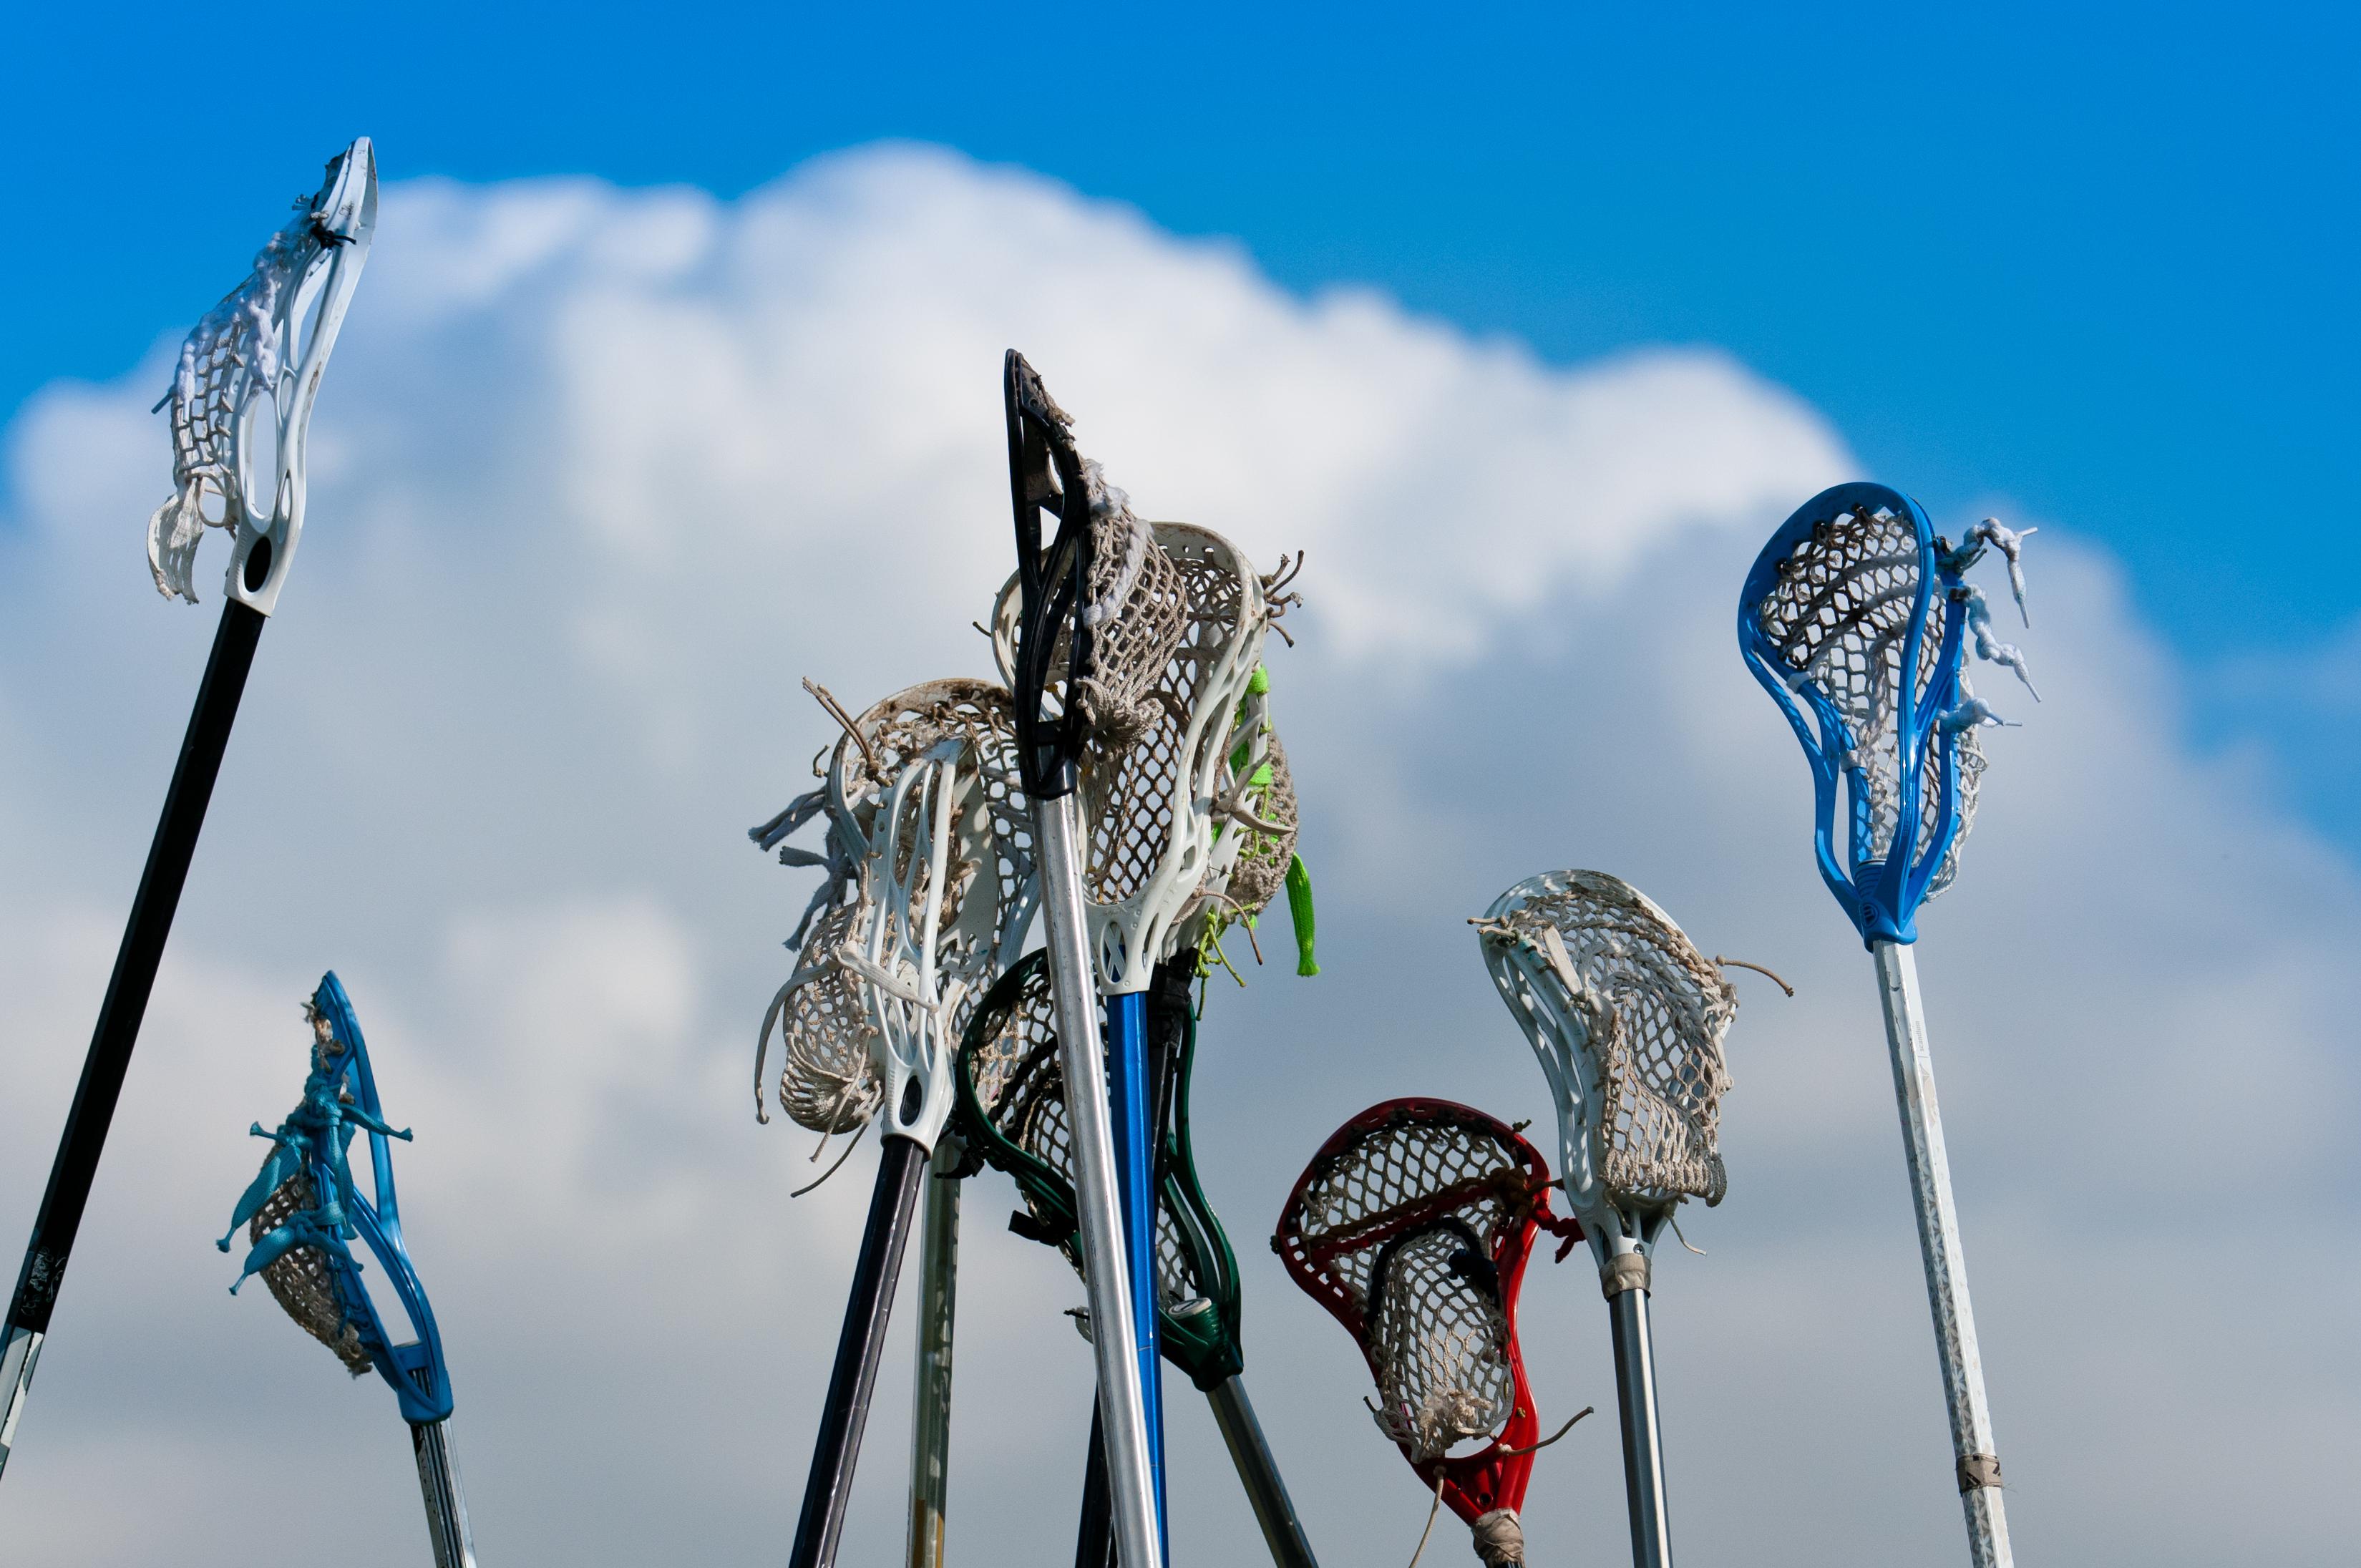 lax sticks at lacrosse training